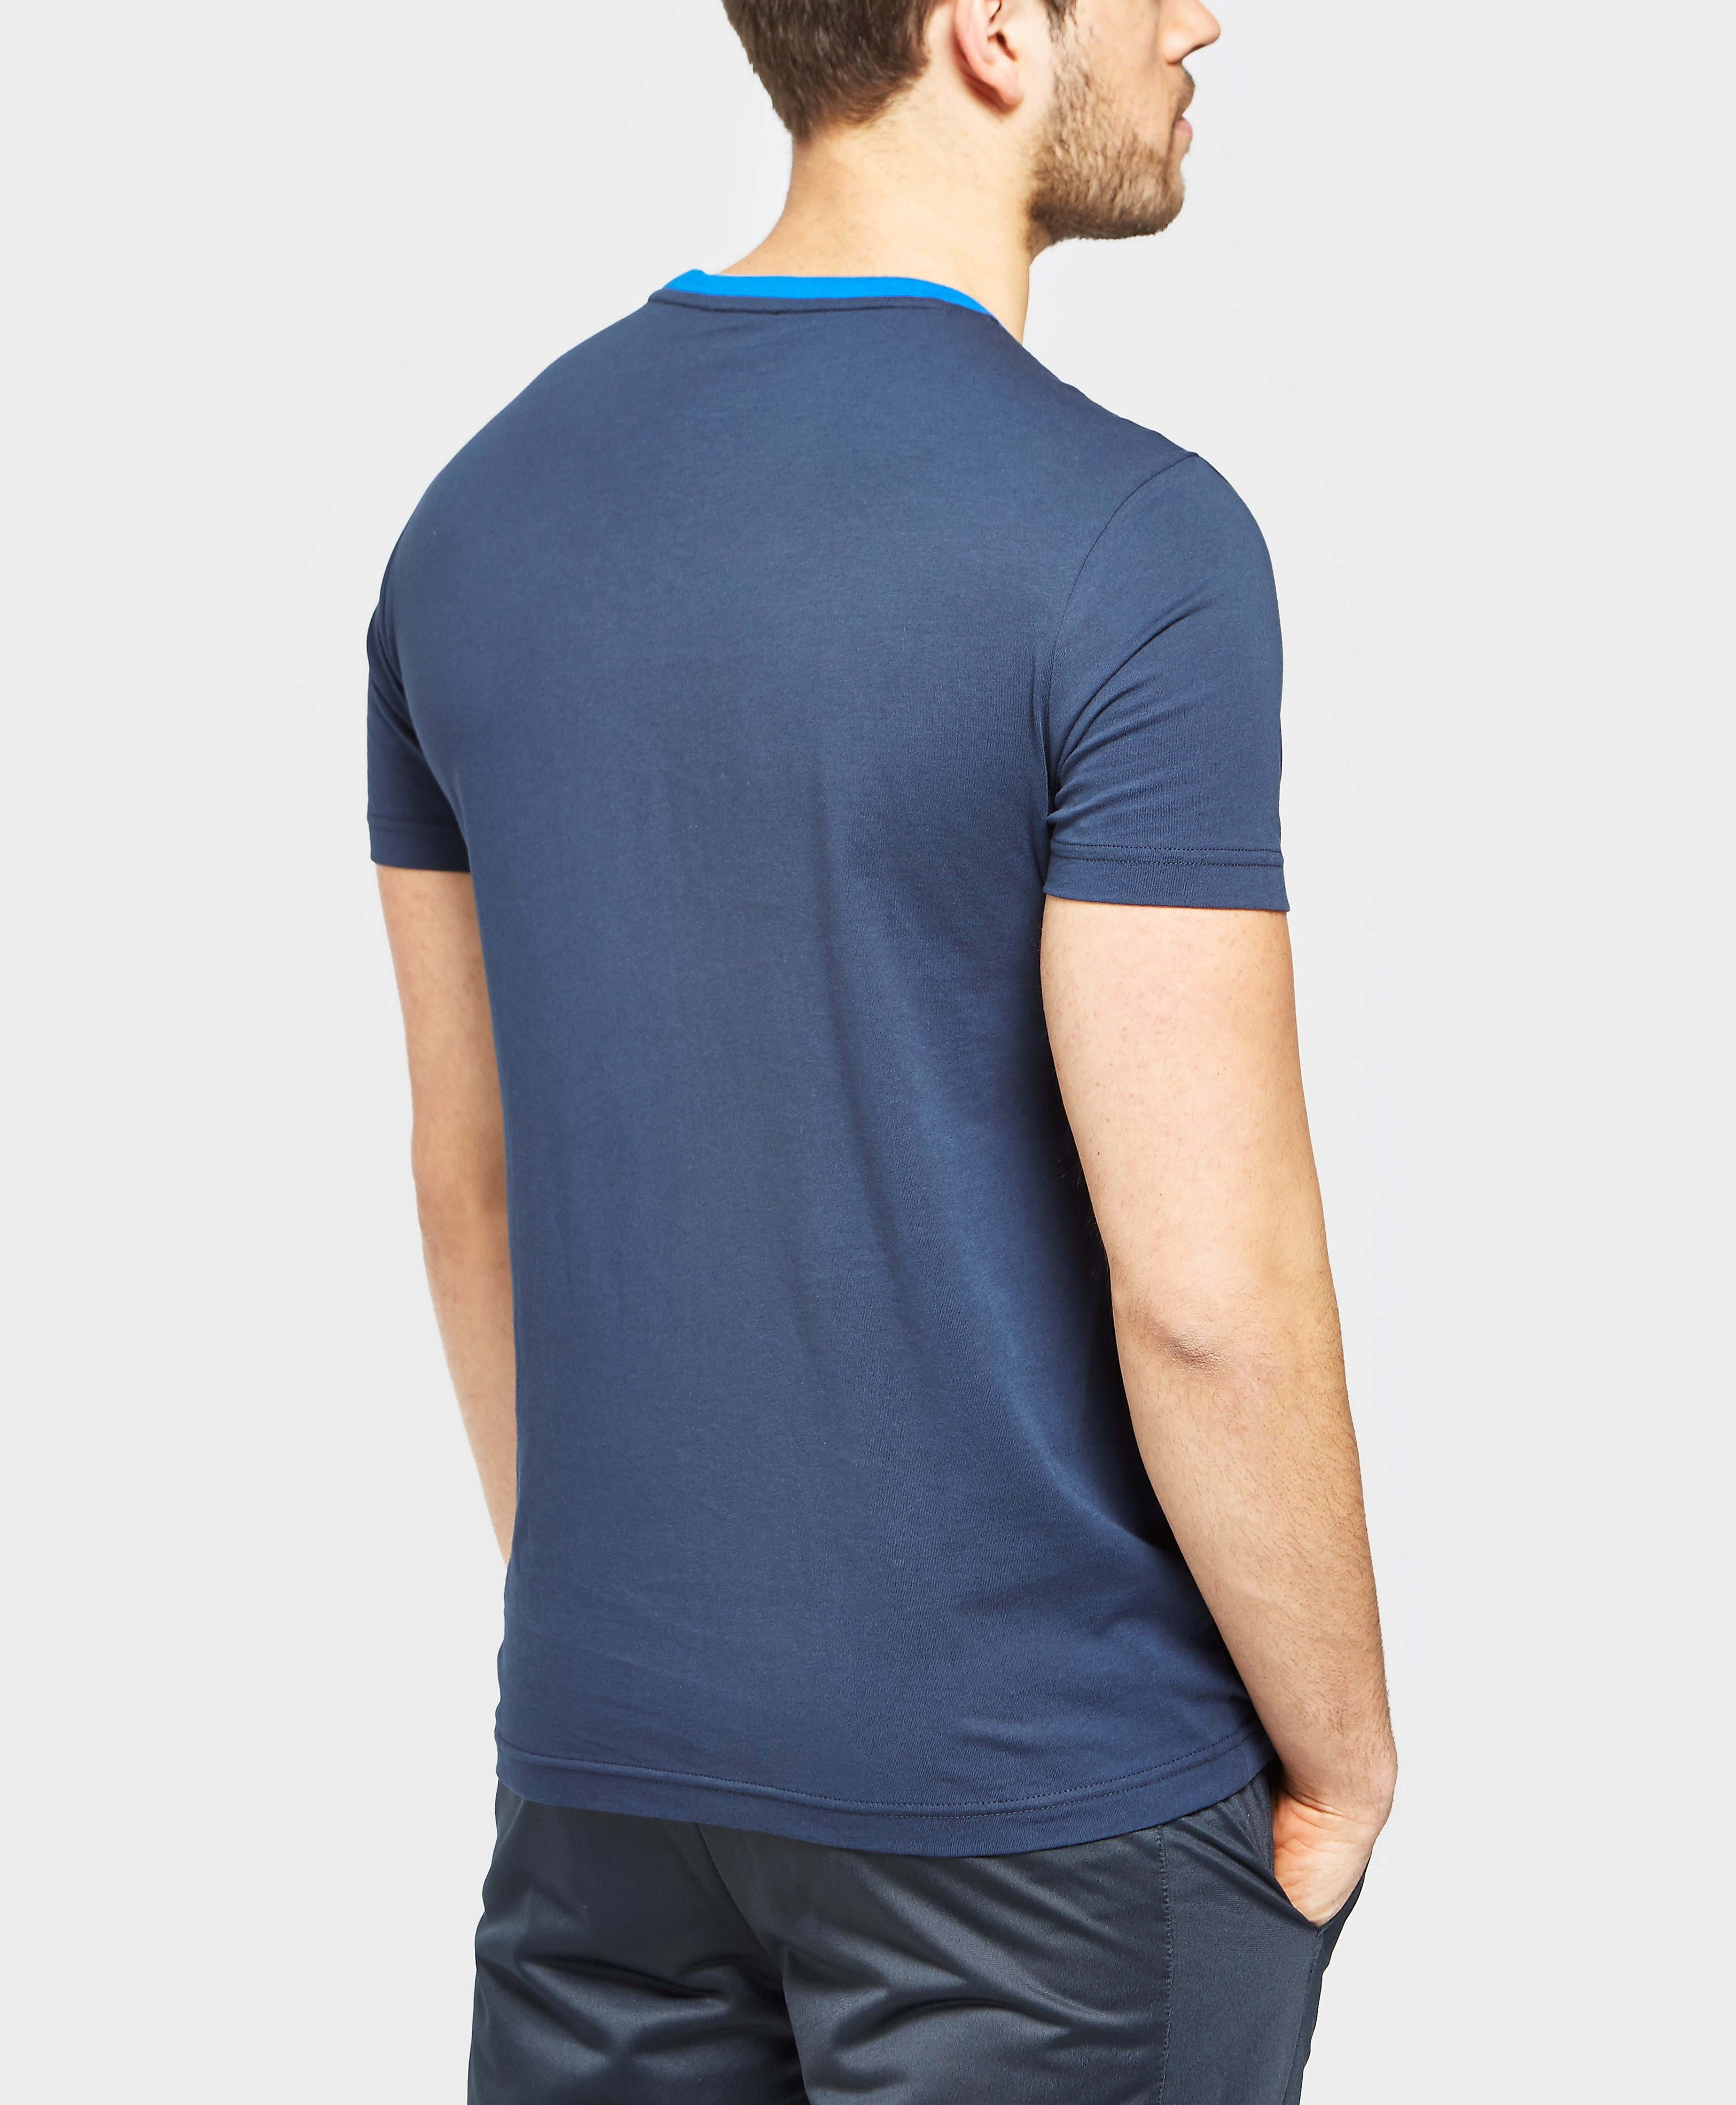 Emporio Armani EA7 Logo T-Shirt - Exclusive